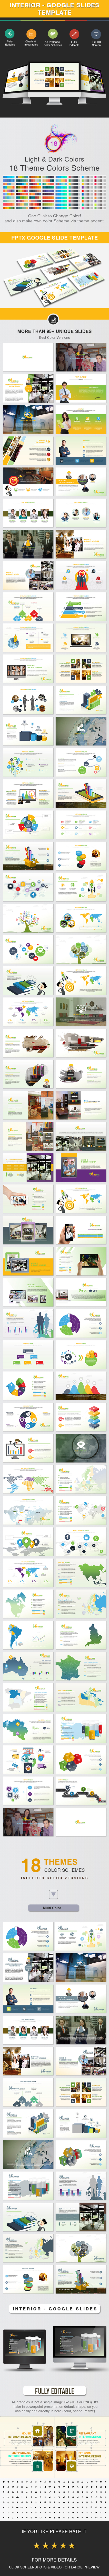 Interior - Google Slides Template - Google Slides Presentation Templates